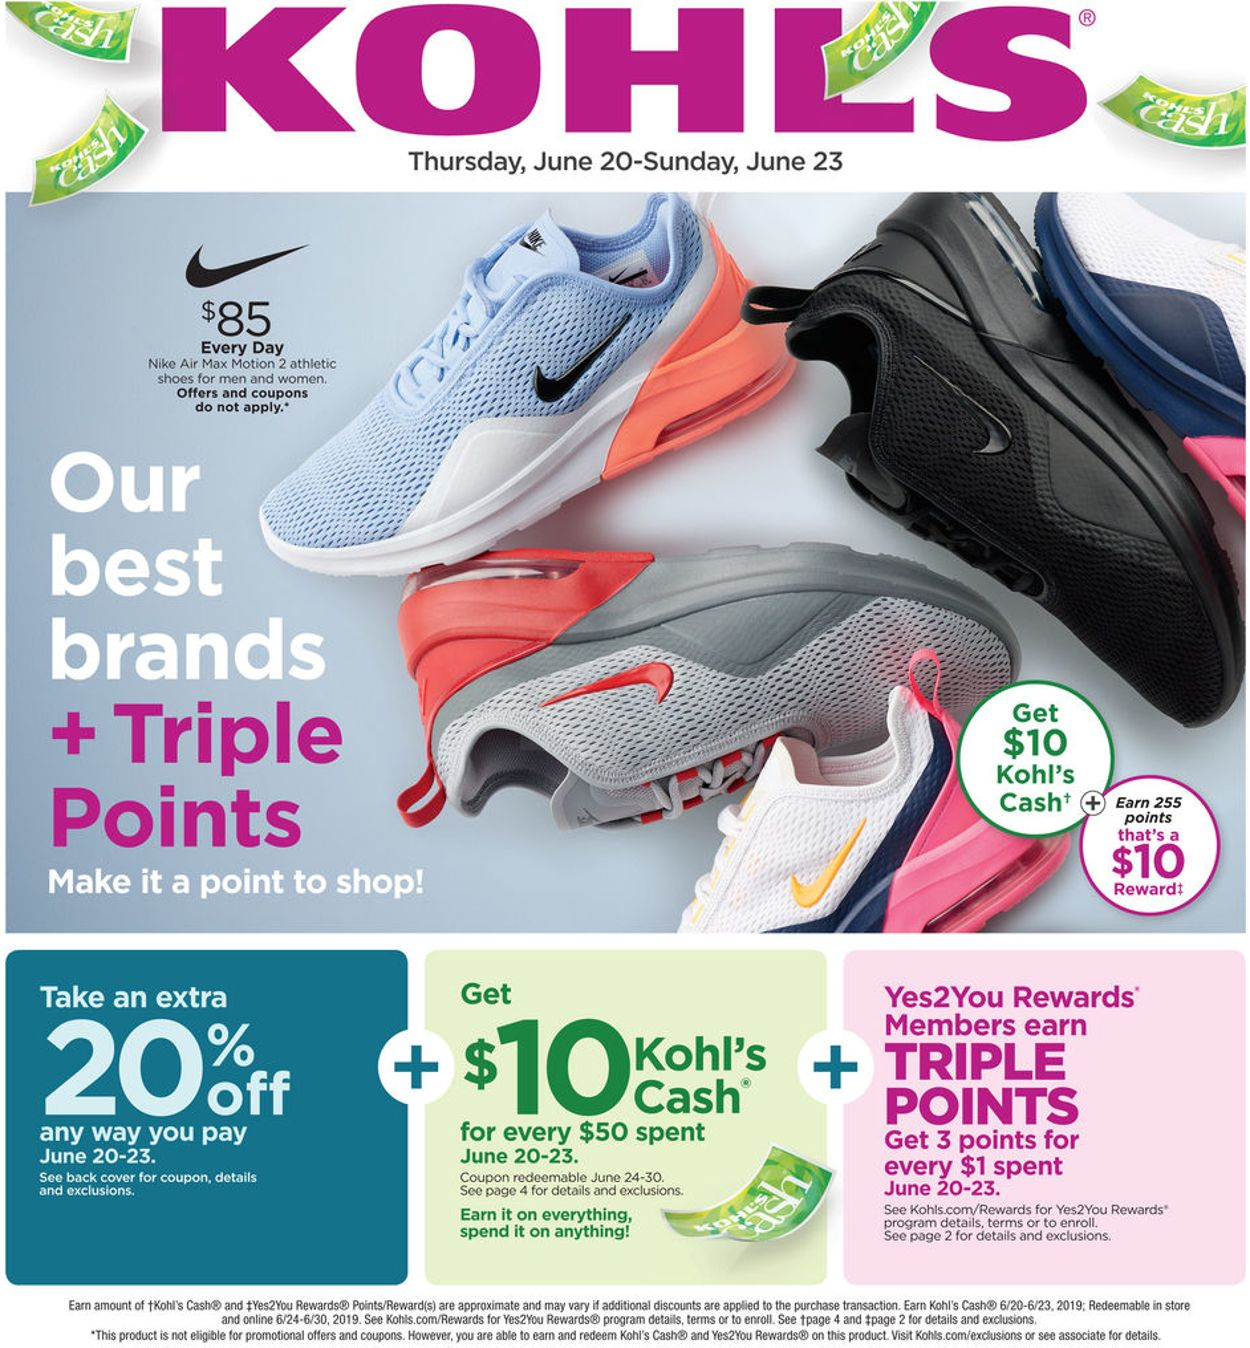 kohl's women's nike tennis shoes